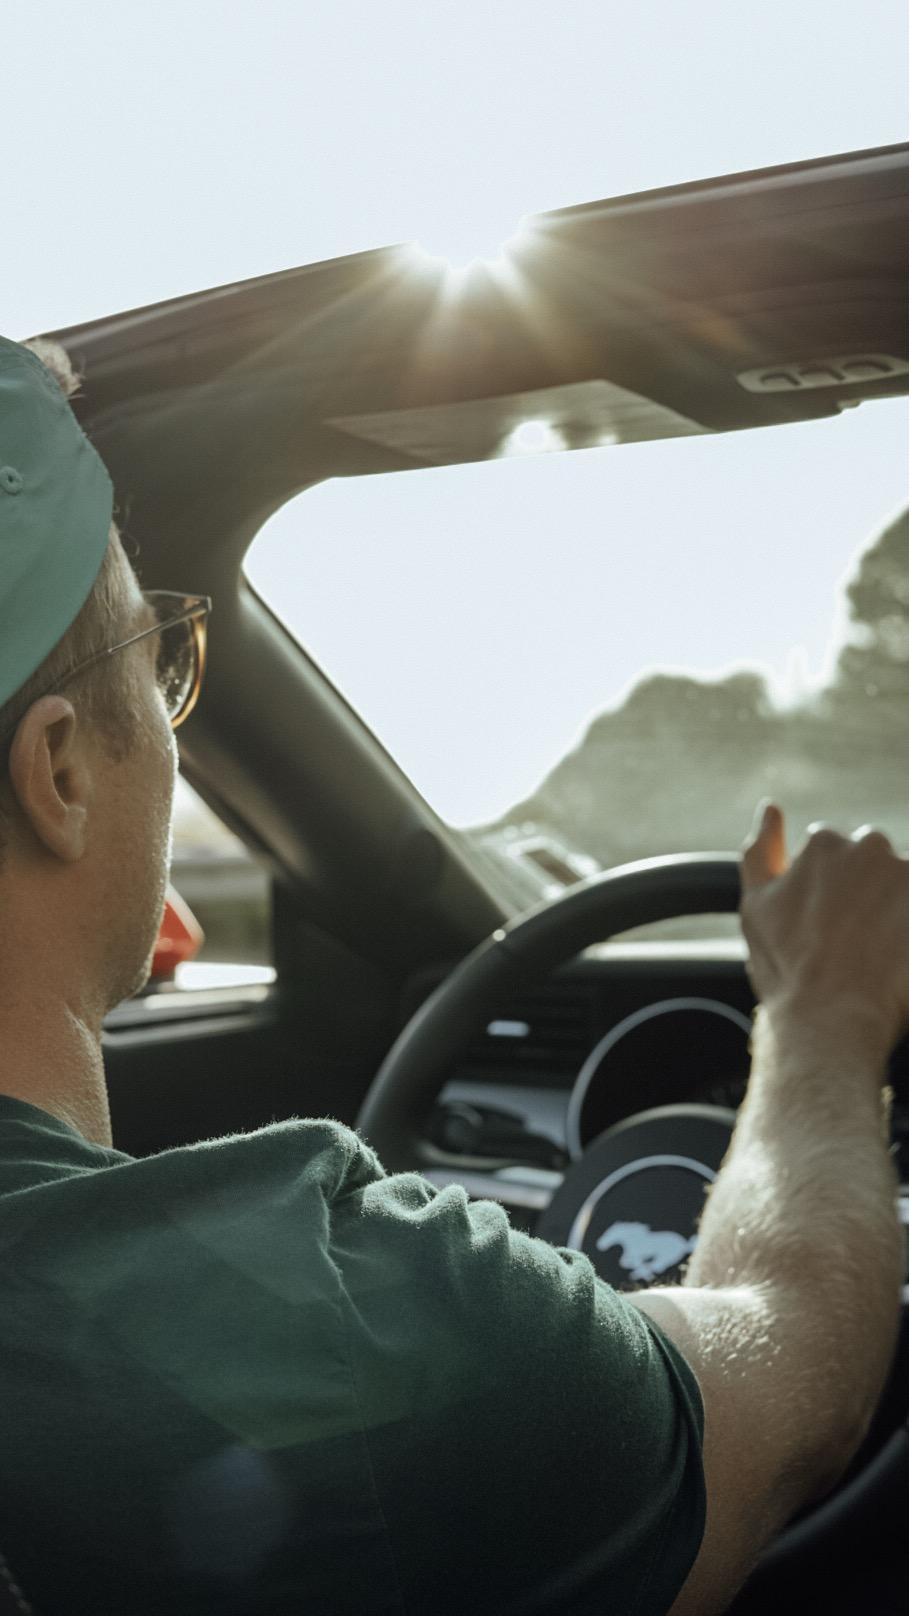 MUSTANG_FORD_CALIFORNIA_DRIVE_CAR_CONVERTIBLE_BOKEH